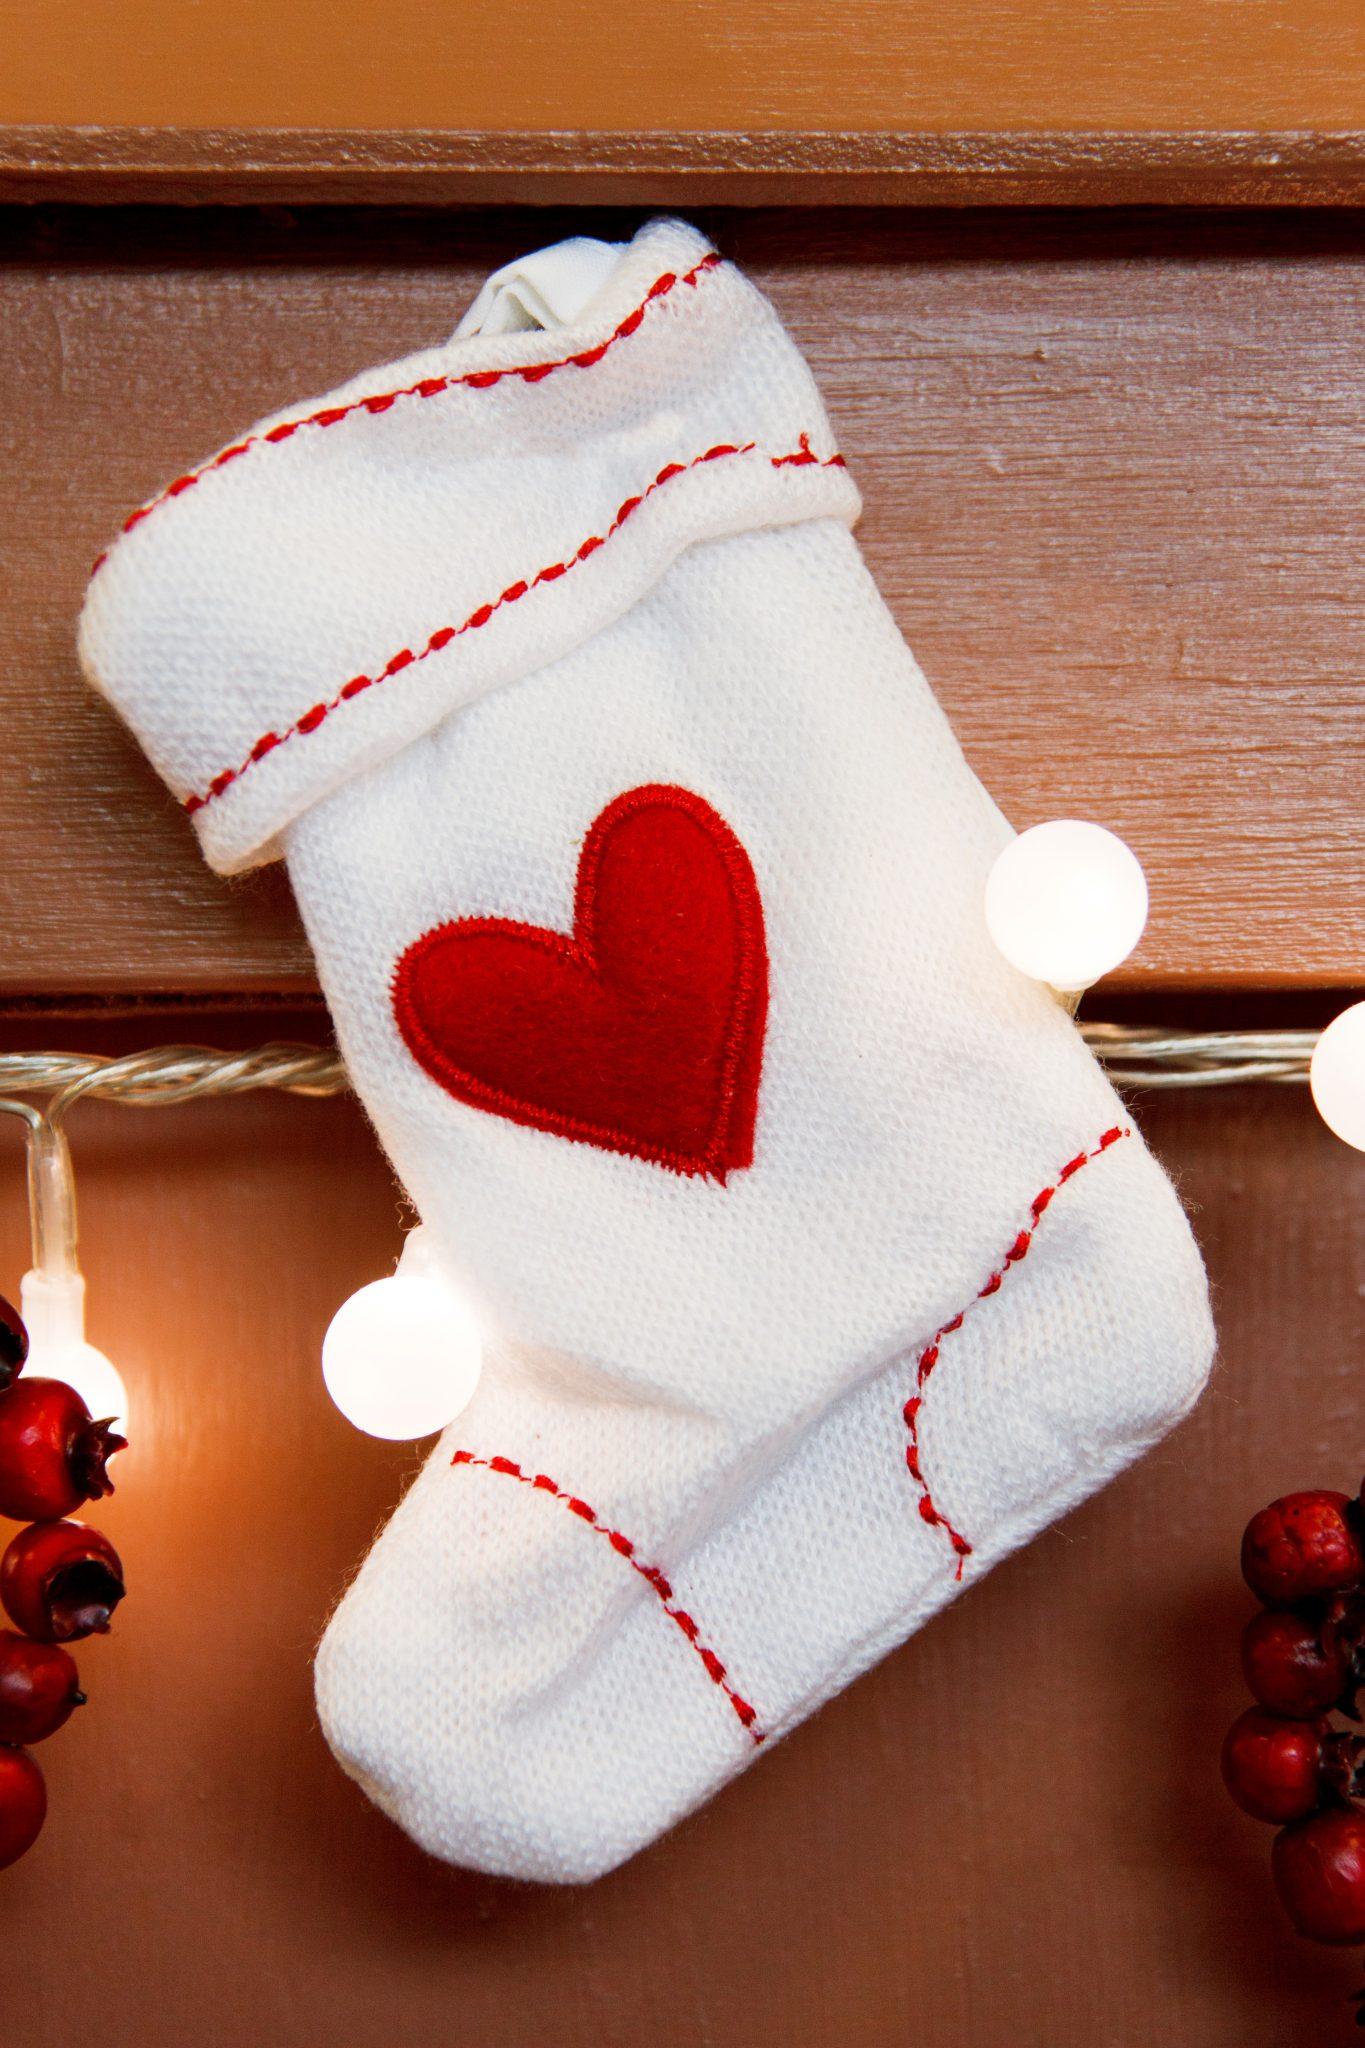 traveling stocking